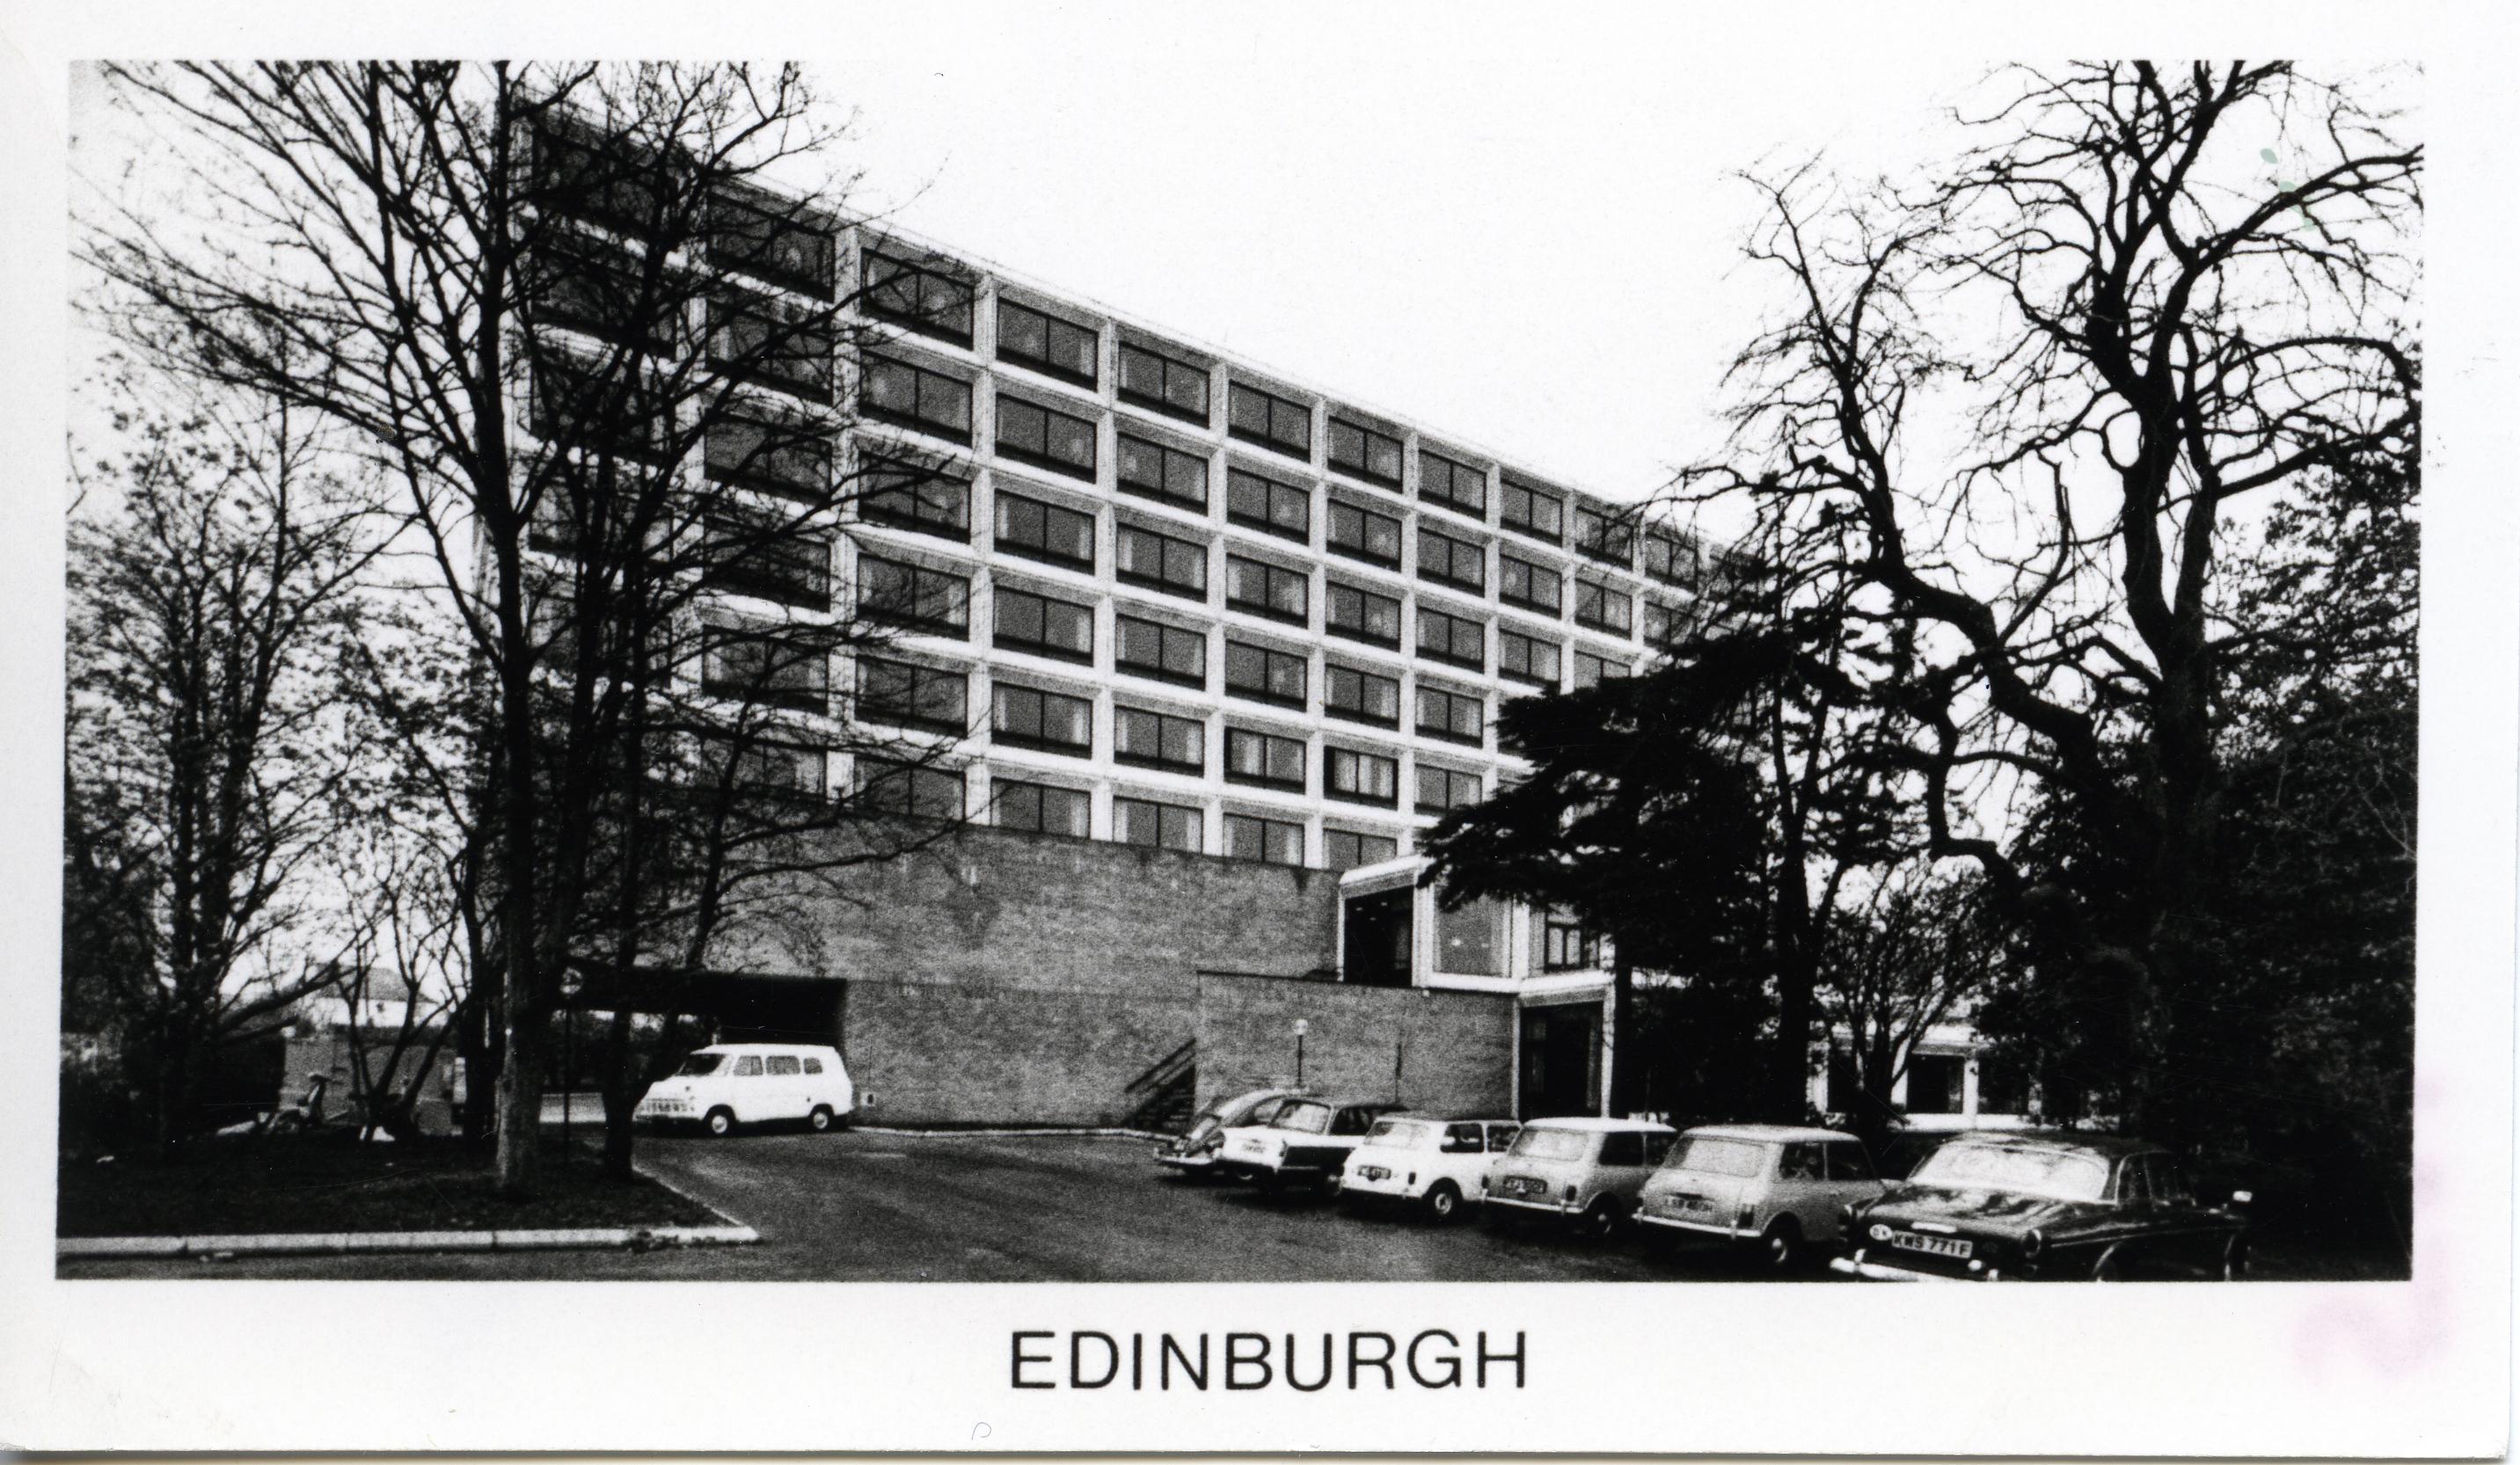 File:Esso motorhotell Edinburgh - SAS2009-10-2331.jpg